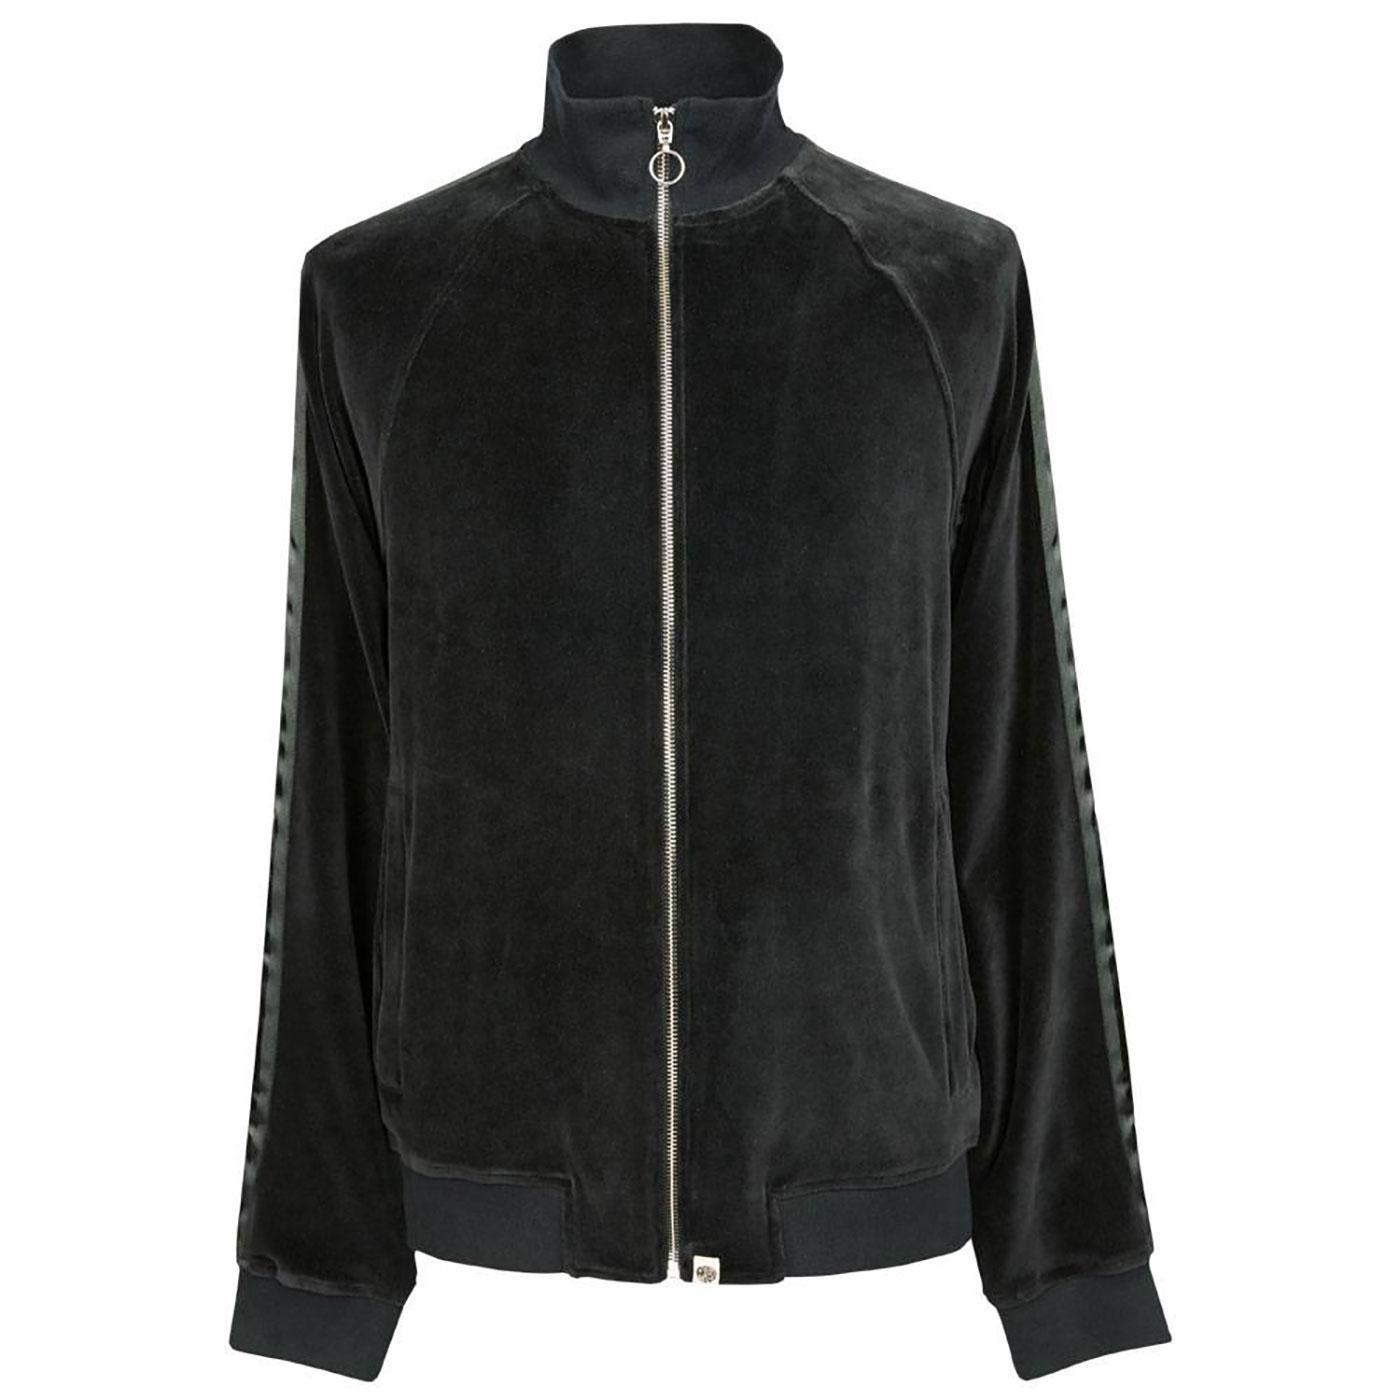 PRETTY GREEN Velour Tape Sleeve Track Jacket BLACK